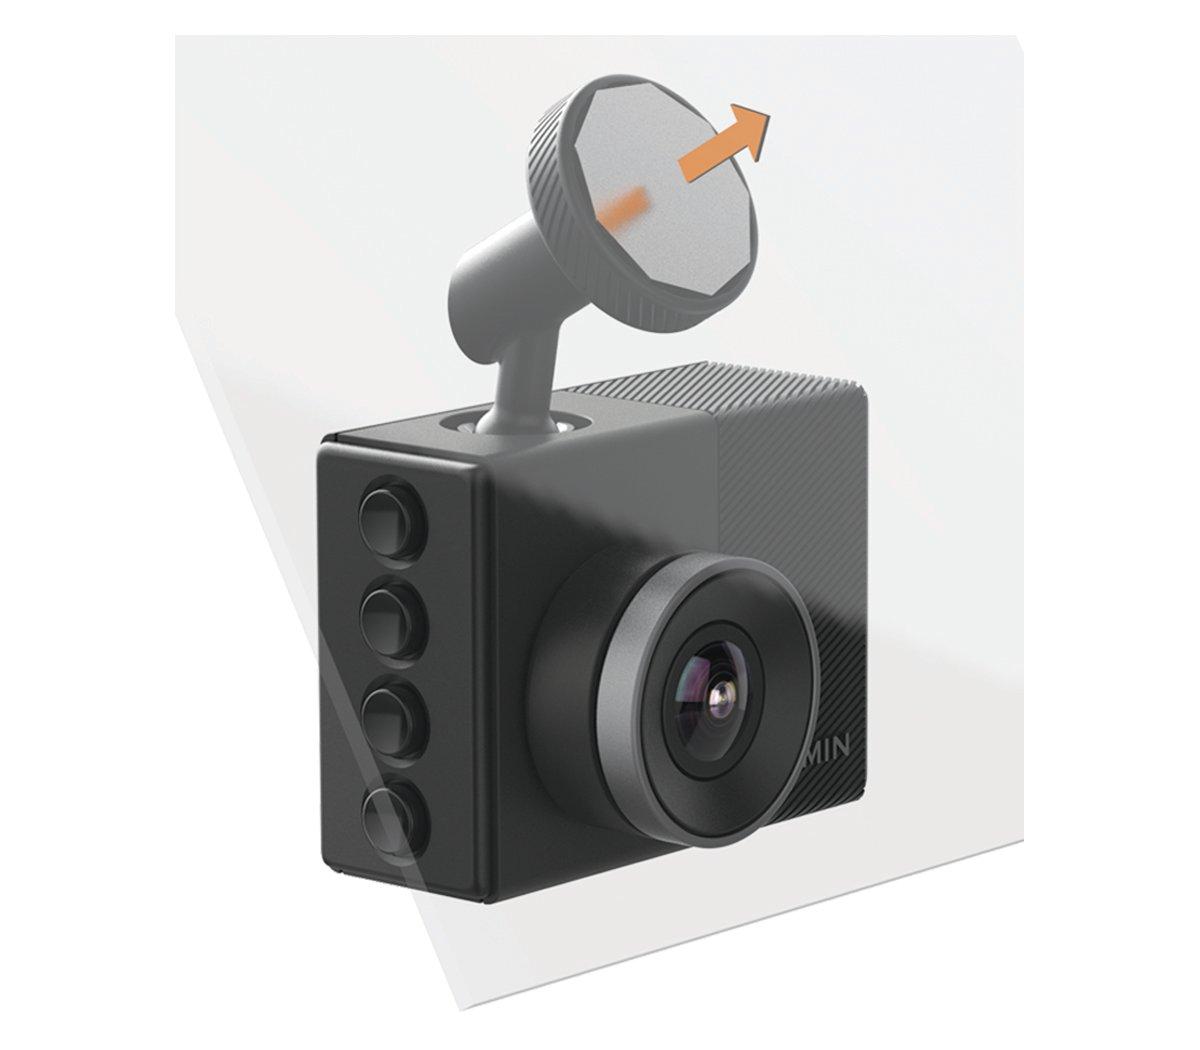 garmin dash cam 45 55 65w installing the mount onto your. Black Bedroom Furniture Sets. Home Design Ideas